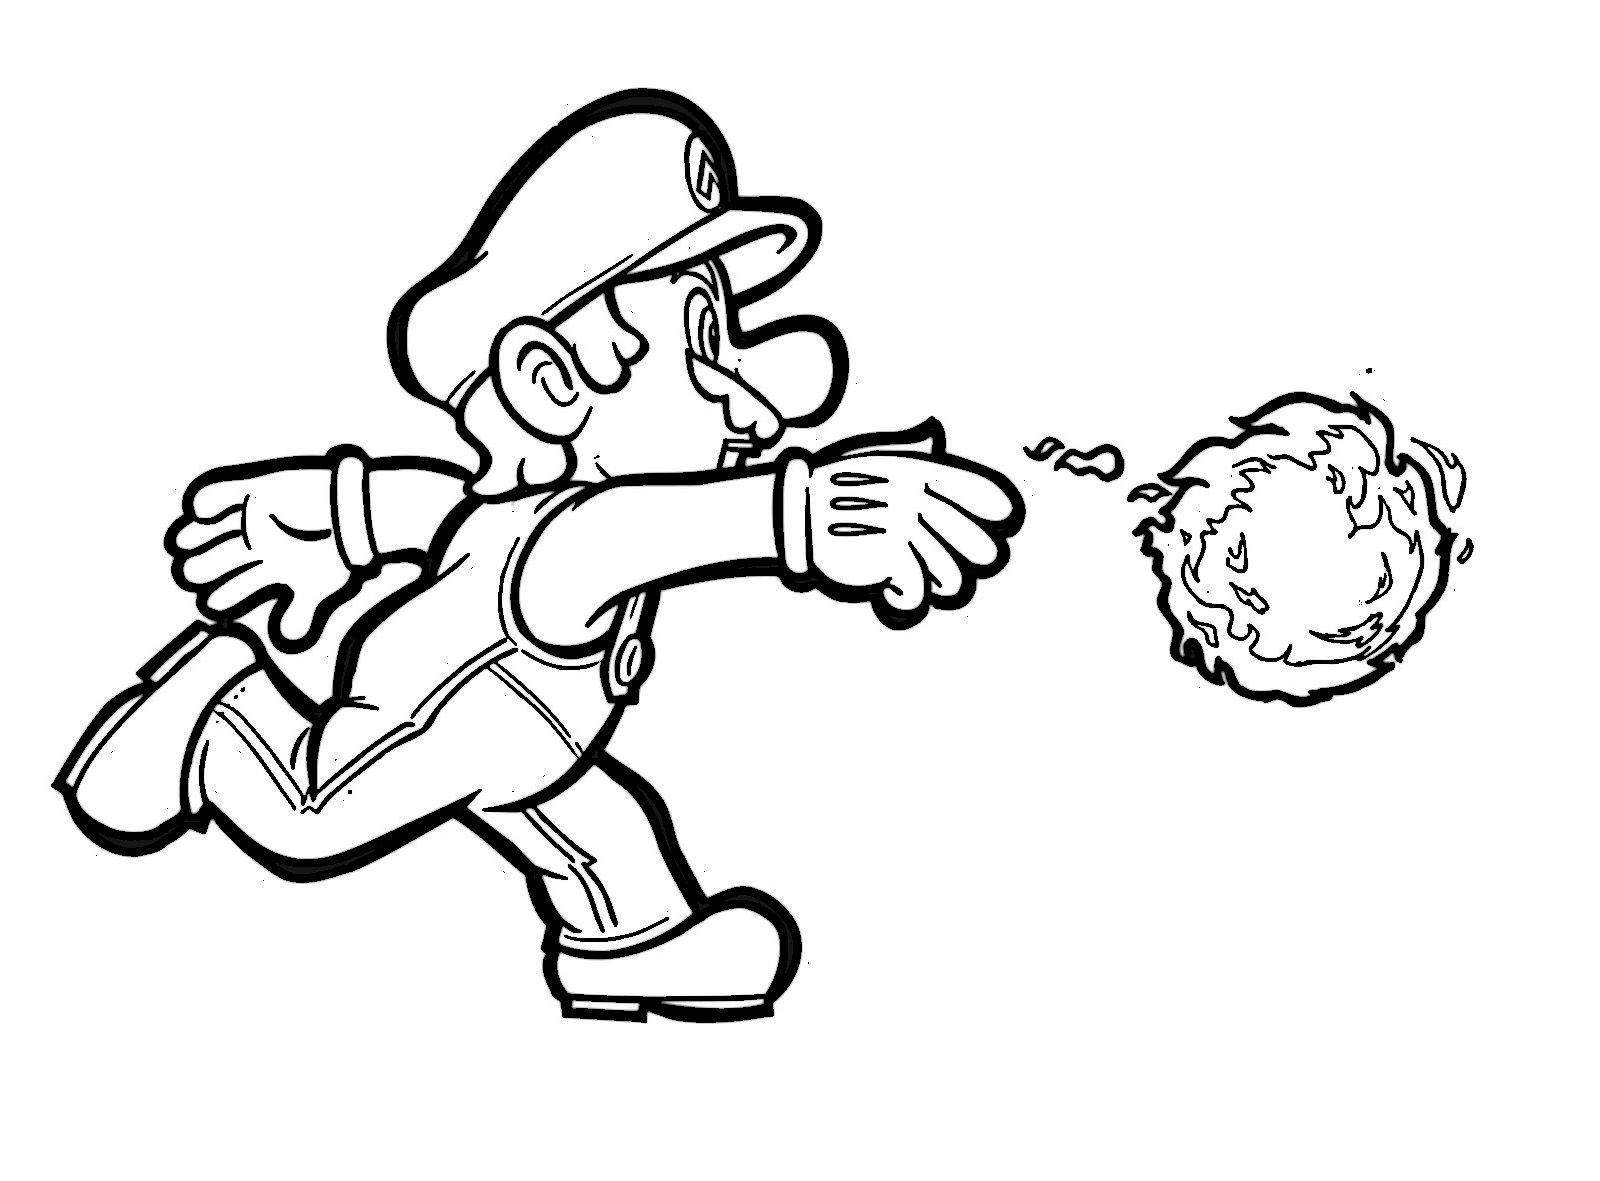 Dibujos para Colorear Mario Bross 3 | art | Pinterest